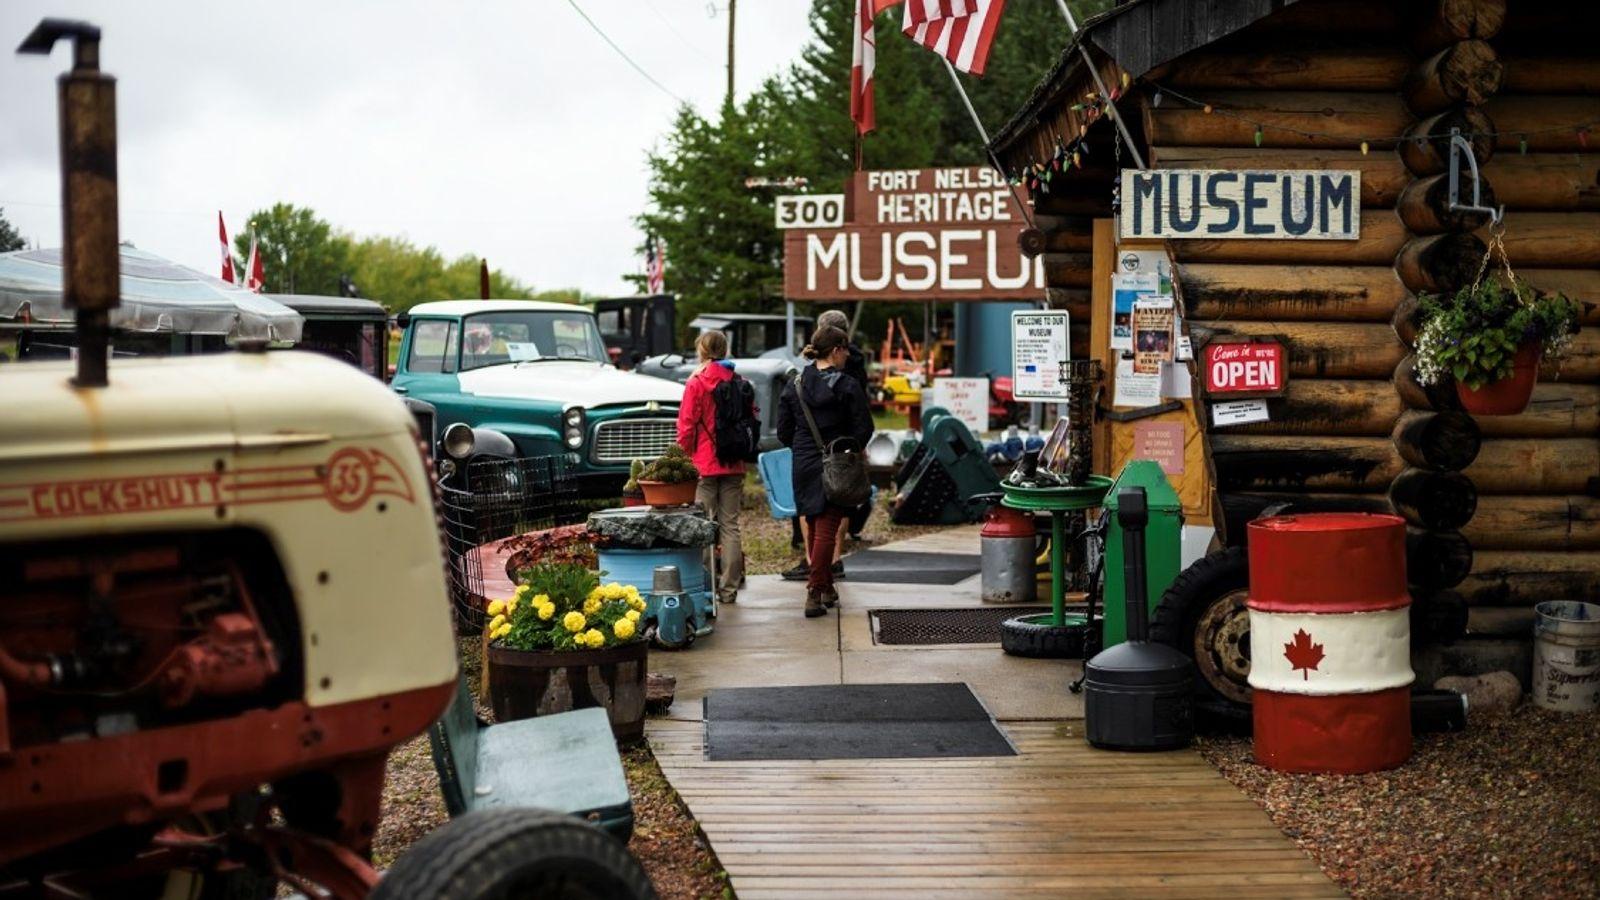 Das Fort Nelson Heritage Museum am Alaska Highway.